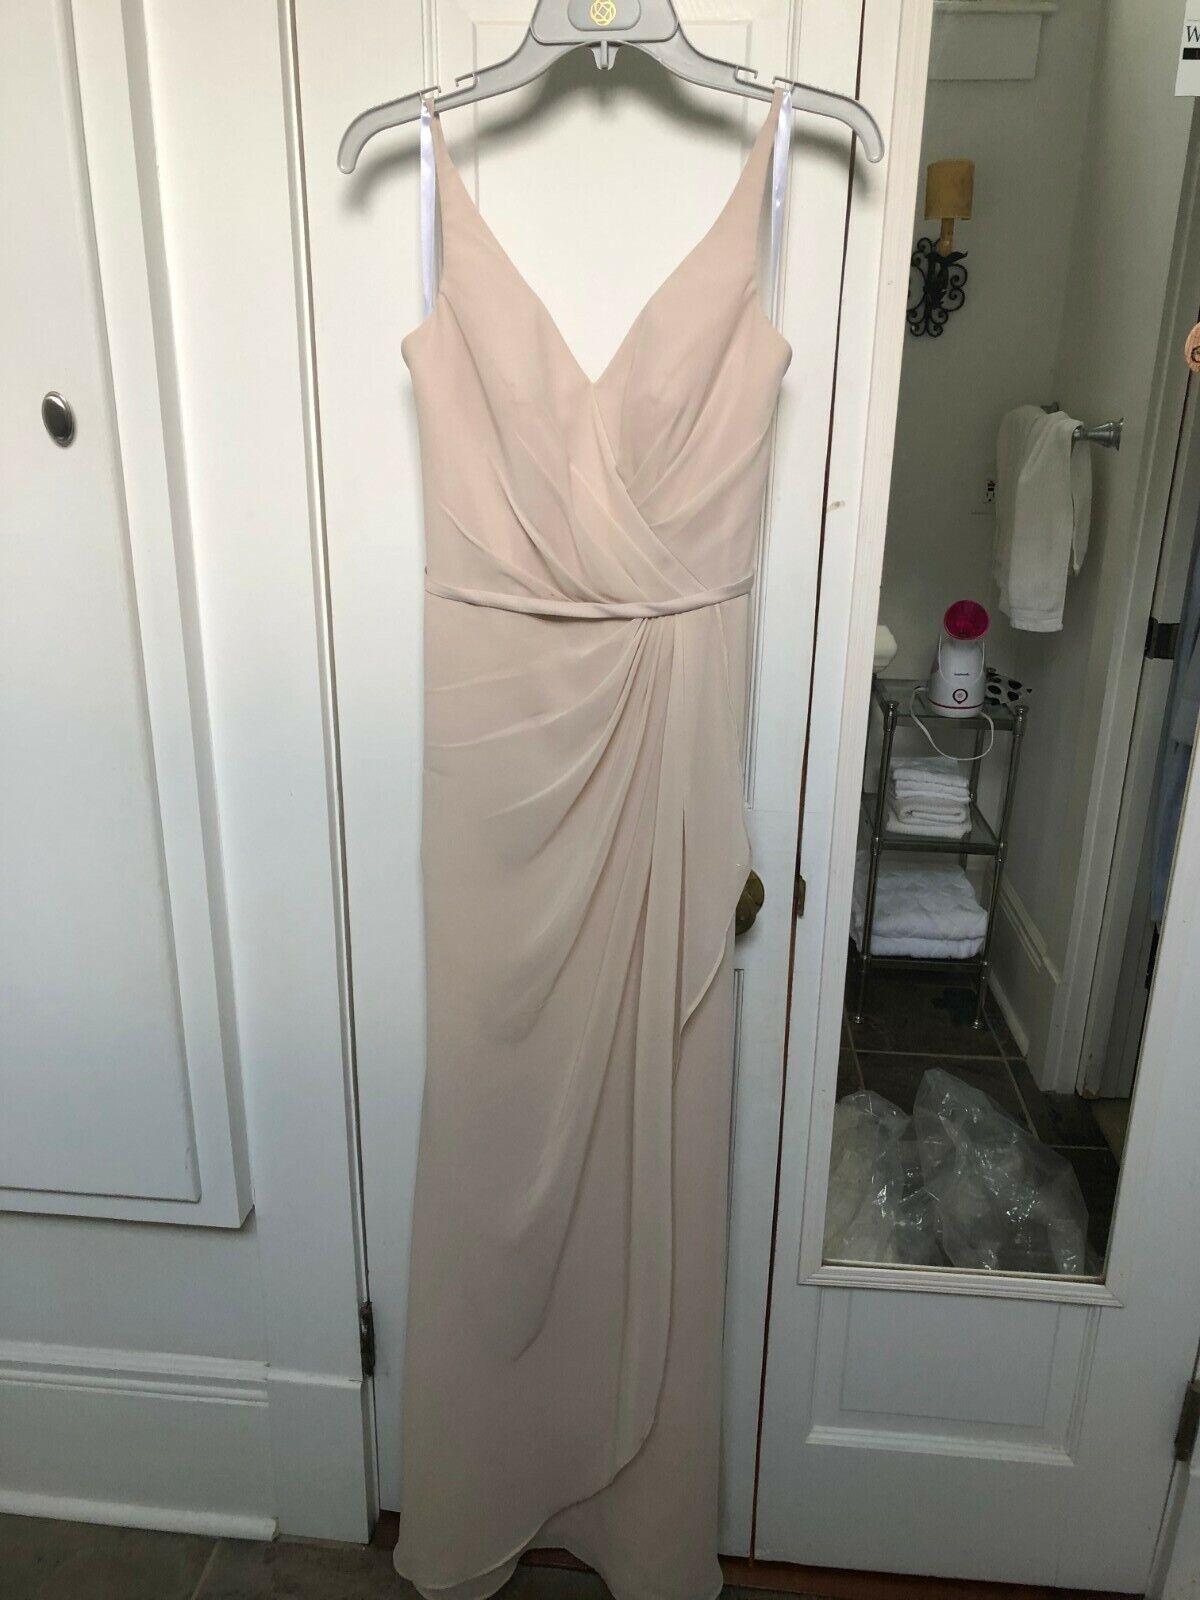 Brideside Dionne Full-Length Bridesmaids Dress, Color: Champagne, Size 2